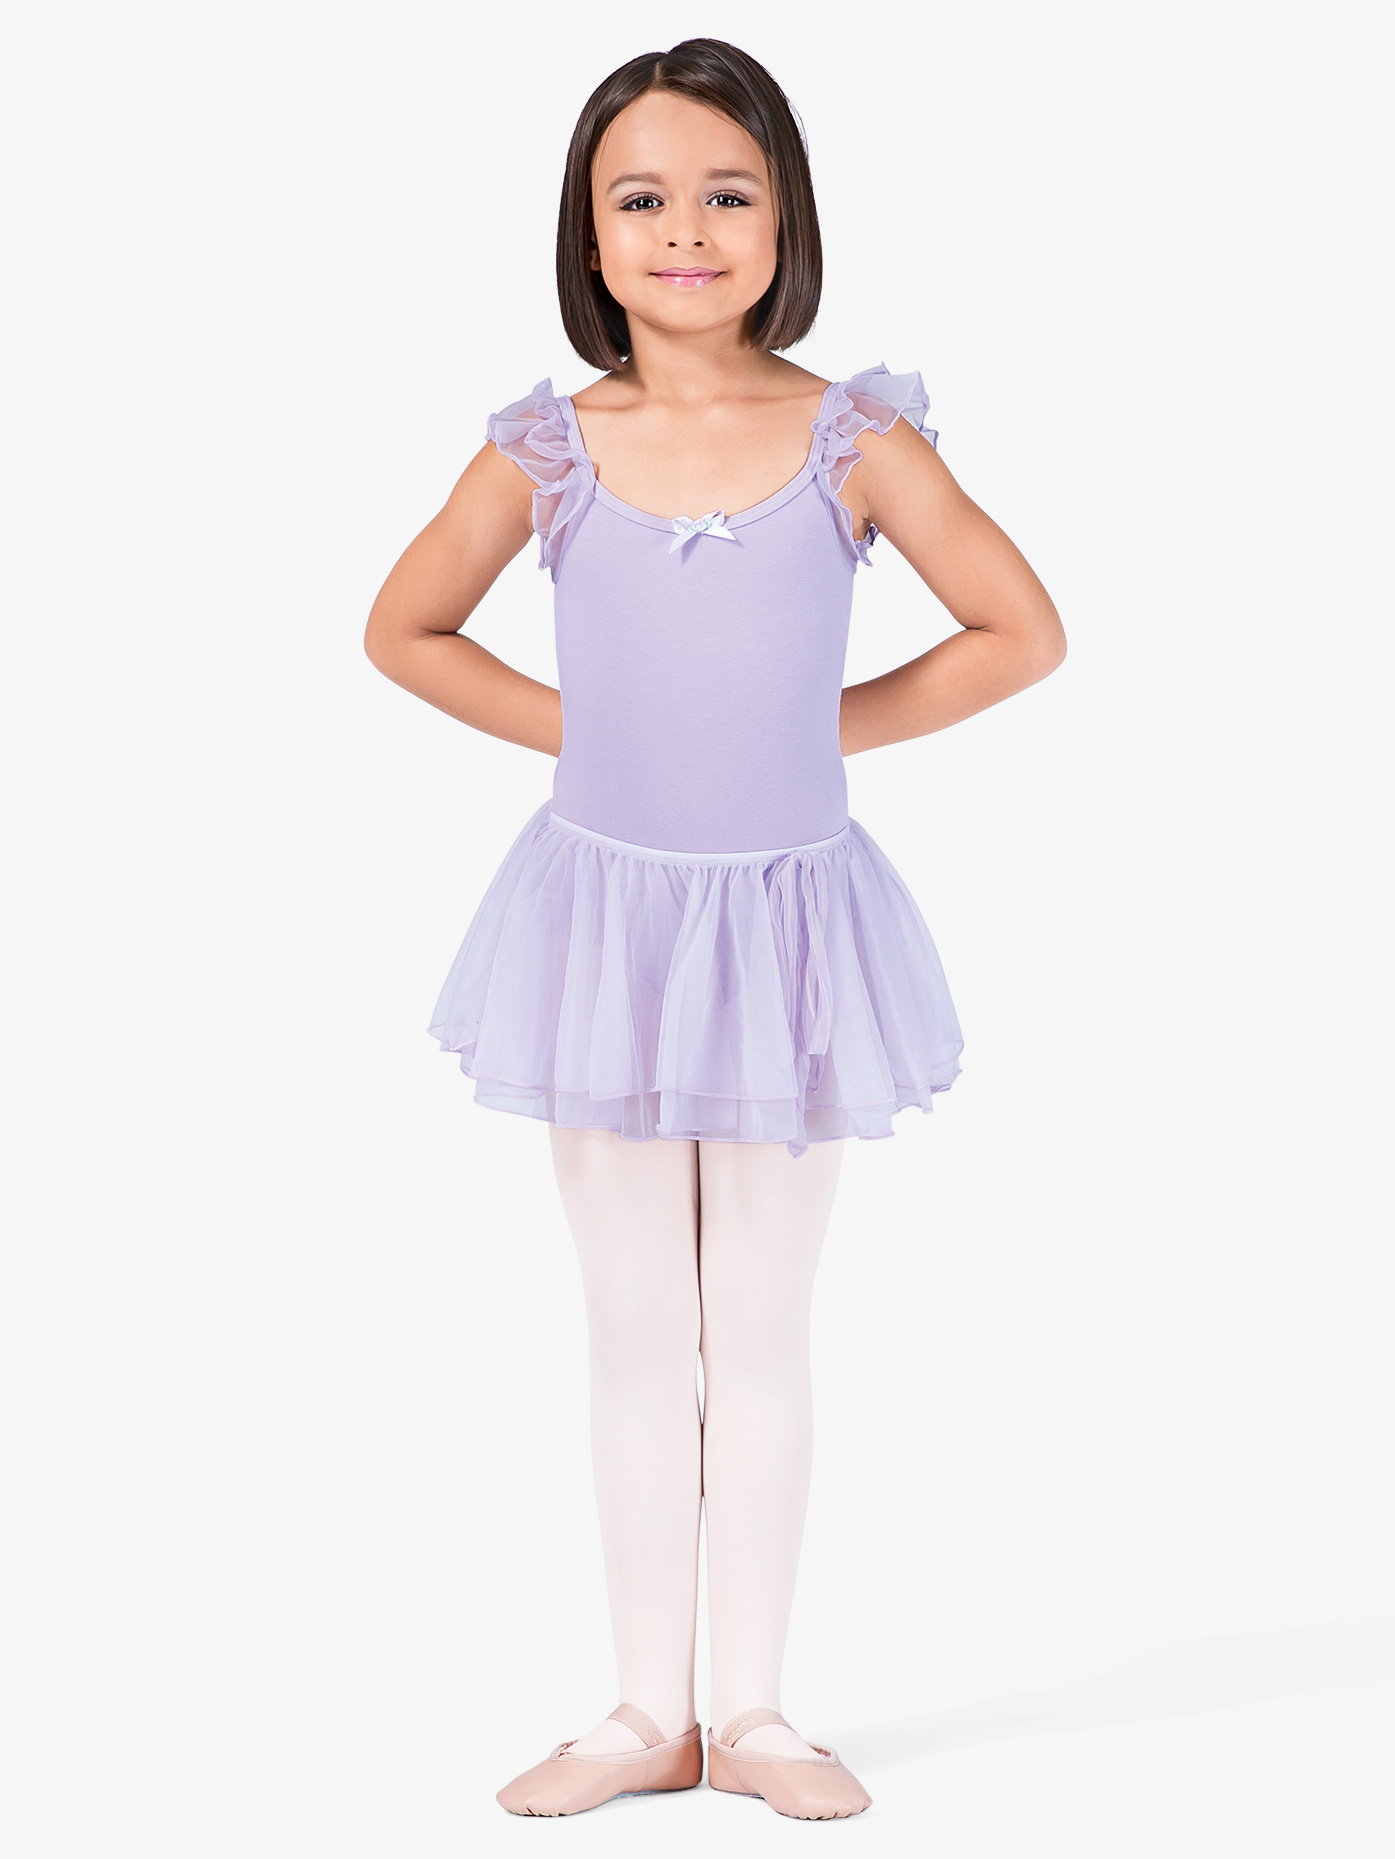 Natalie Child Chiffon Skirt PB502C